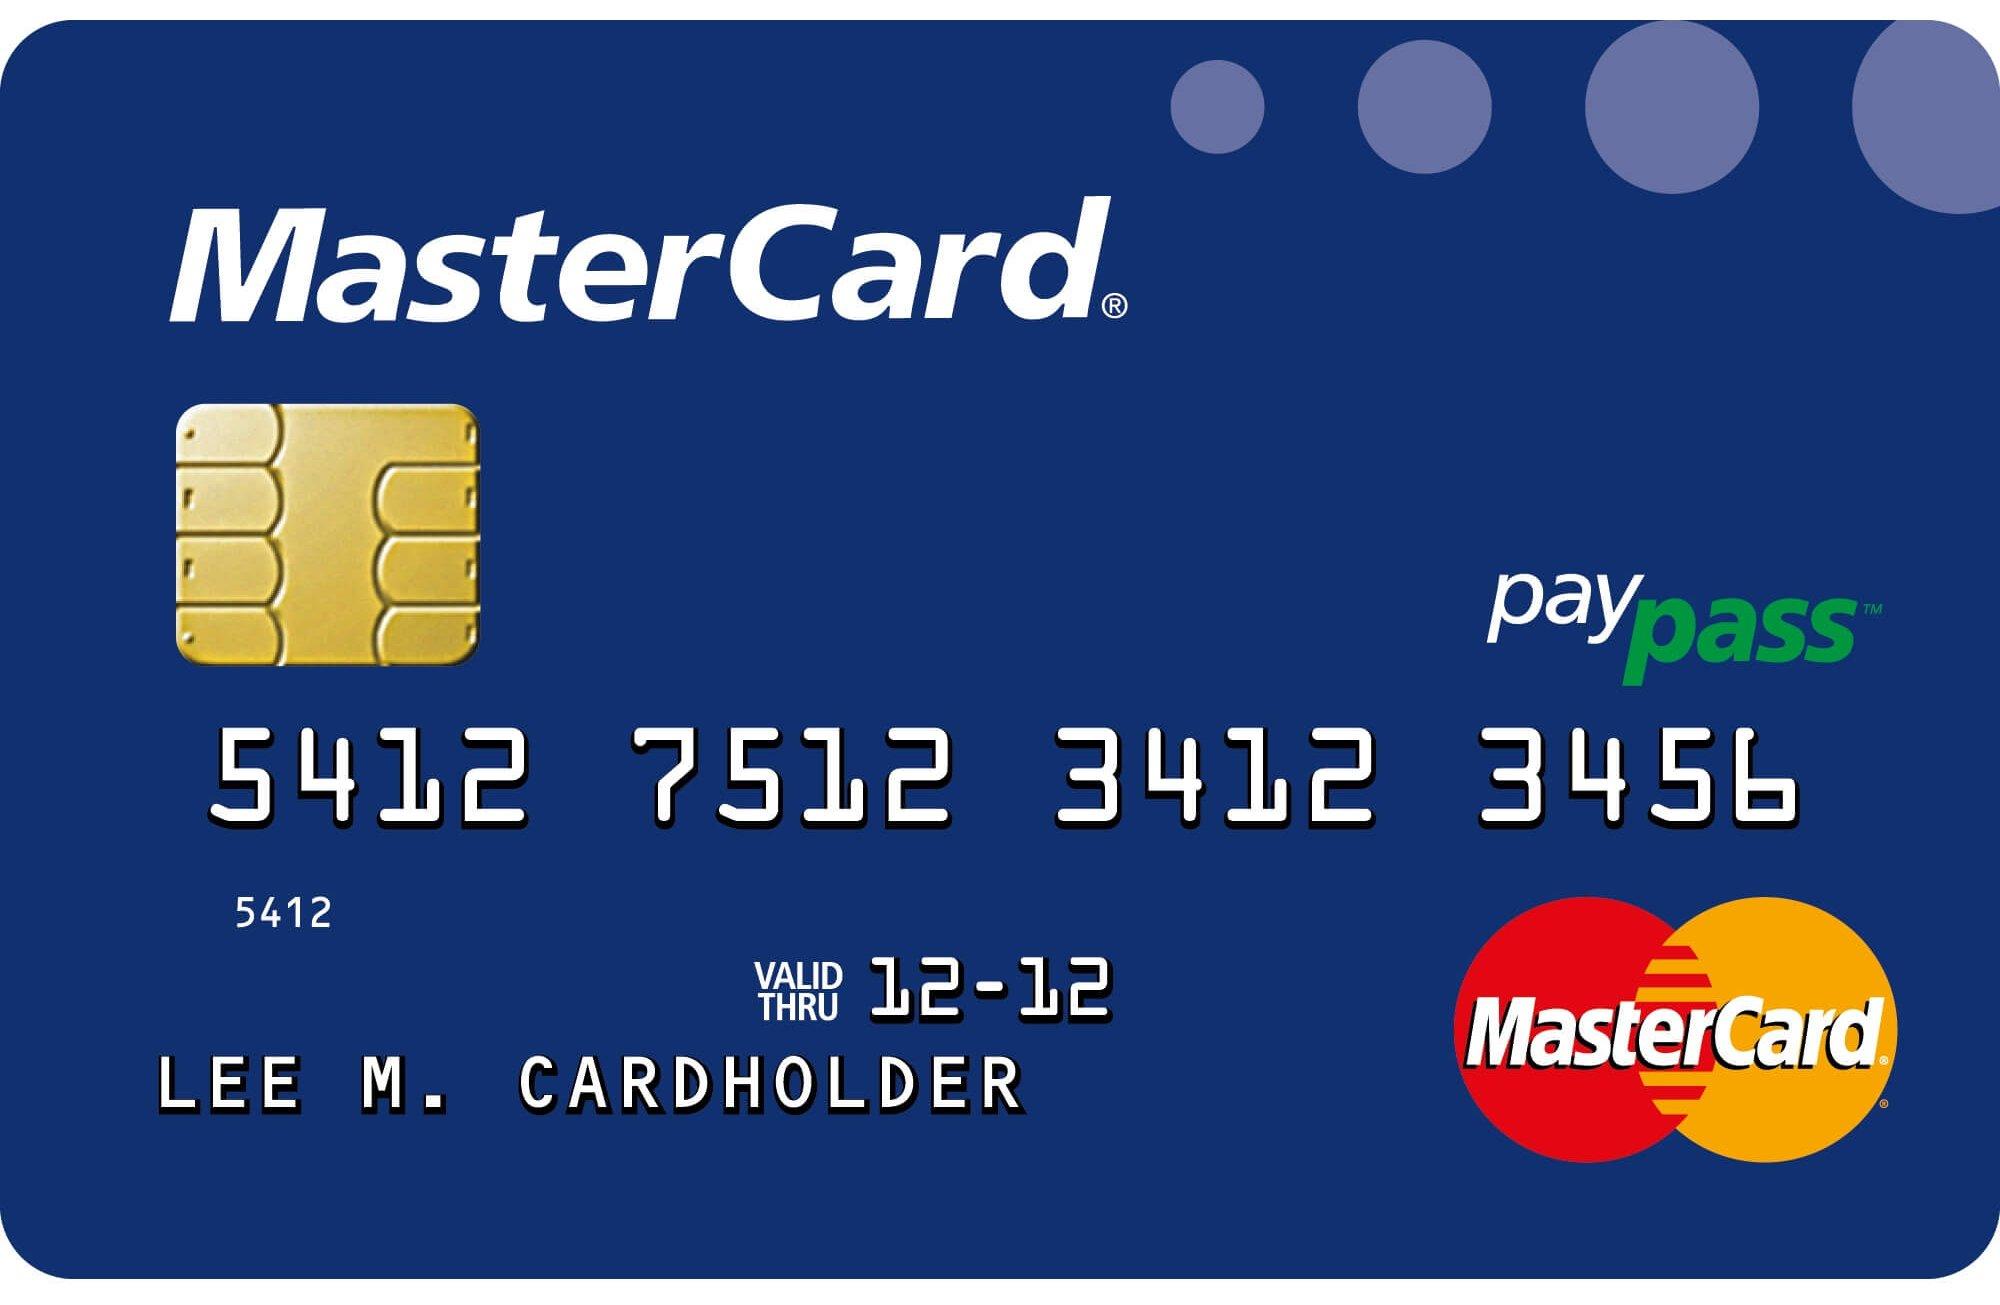 خرید مستر کارت